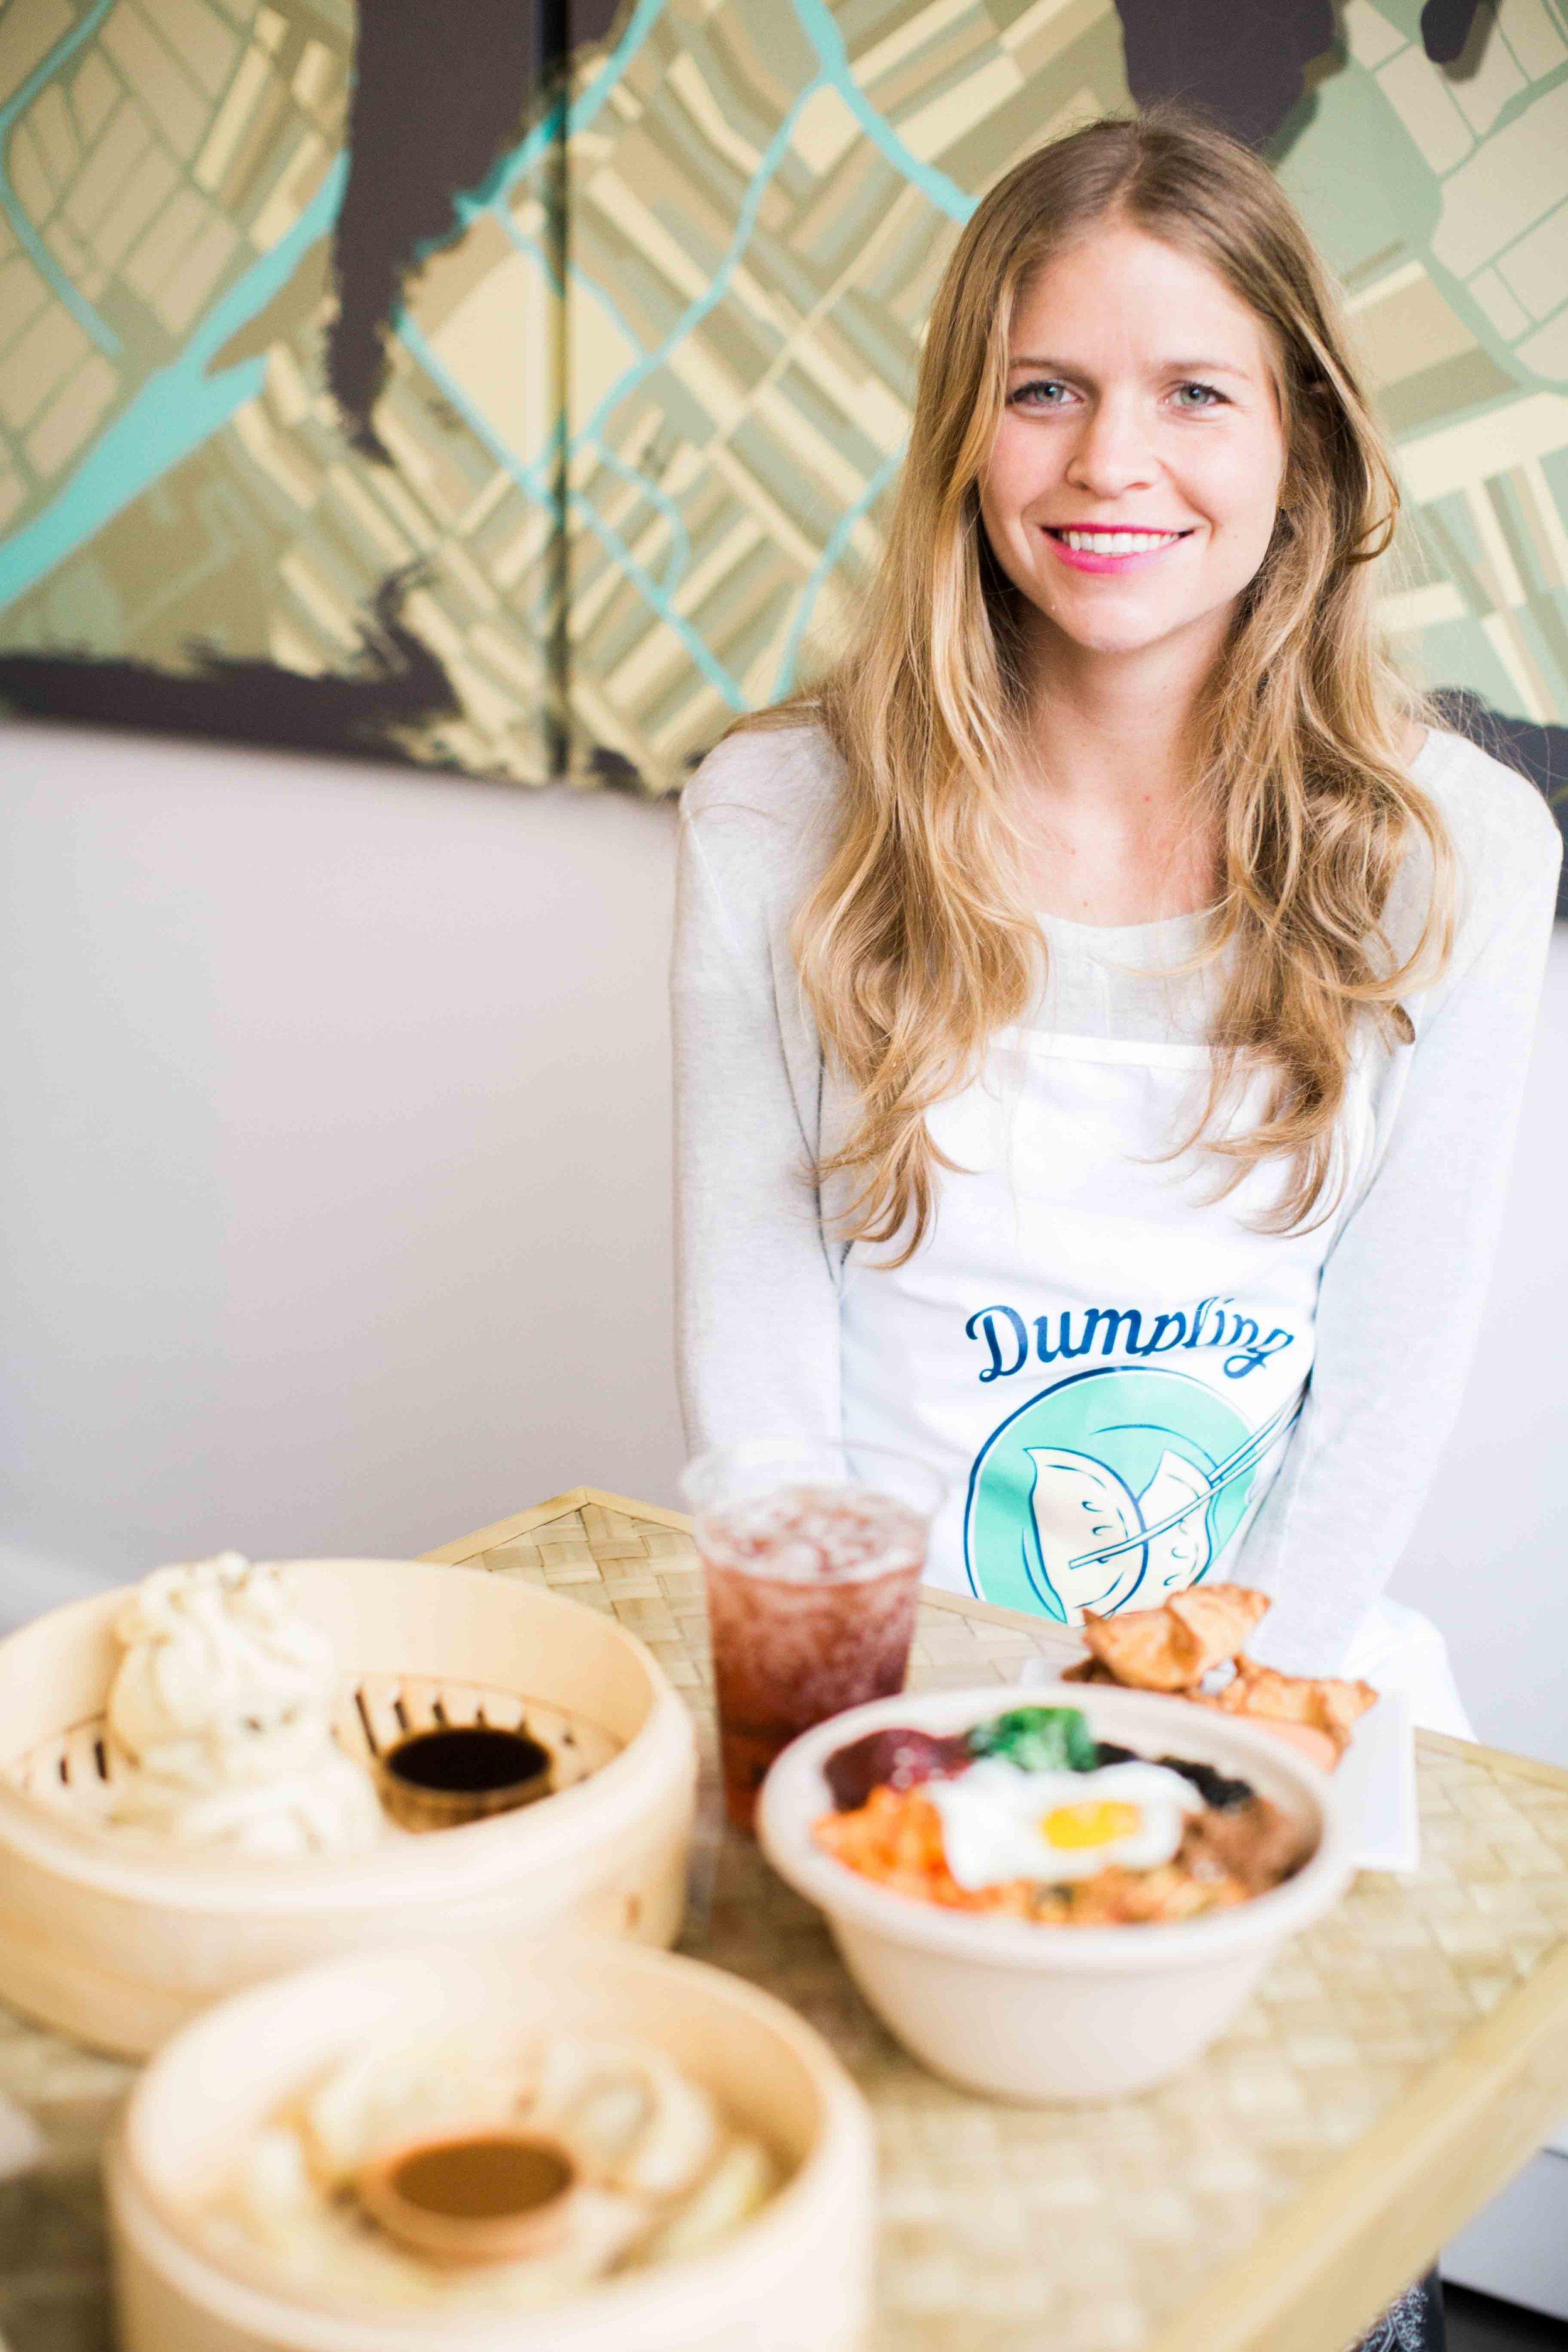 Dumpling-Darling-Restaurant-Iowa-City.jpg